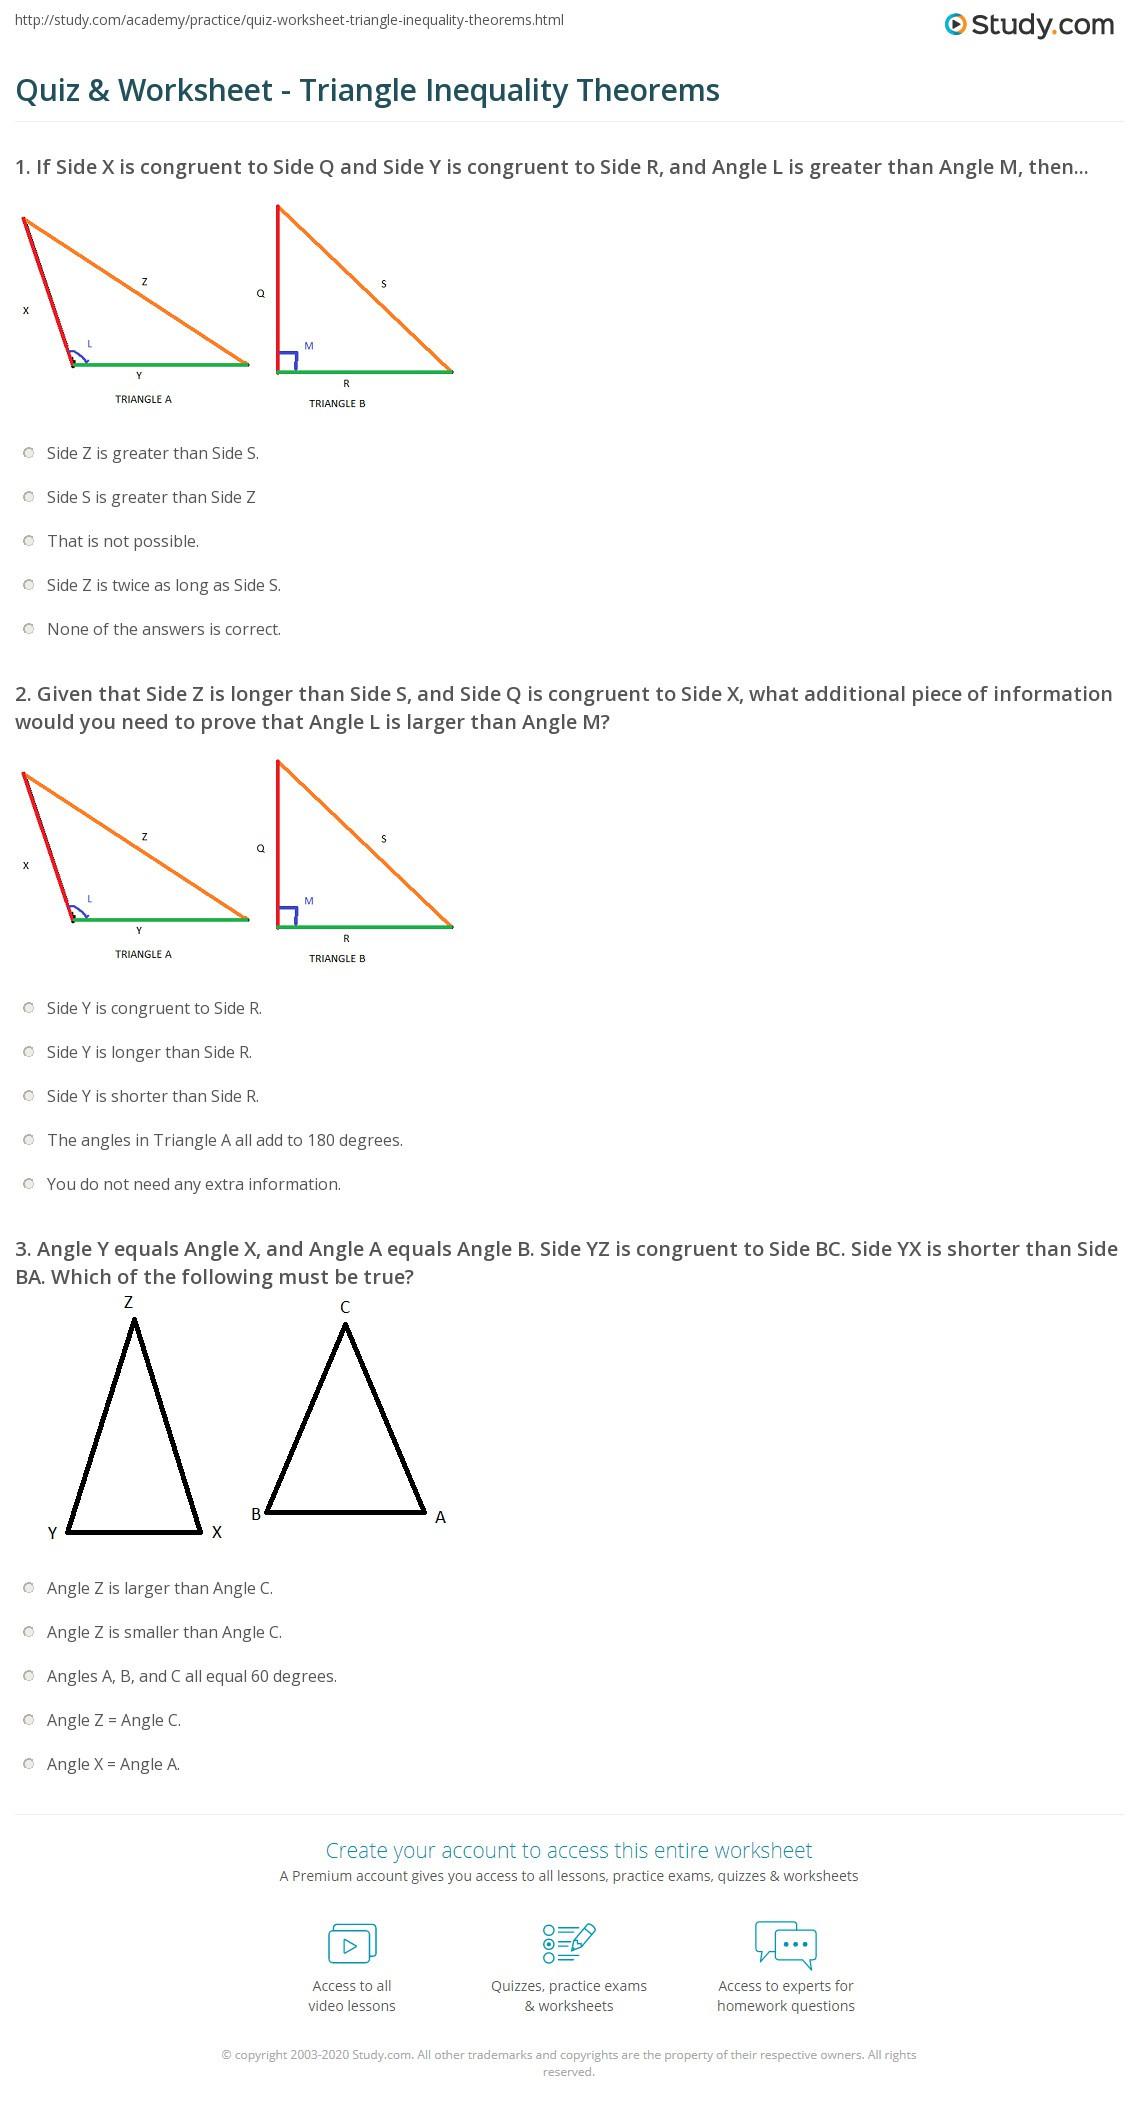 Triangle Inequality theorem Worksheet Quiz & Worksheet Triangle Inequality theorems